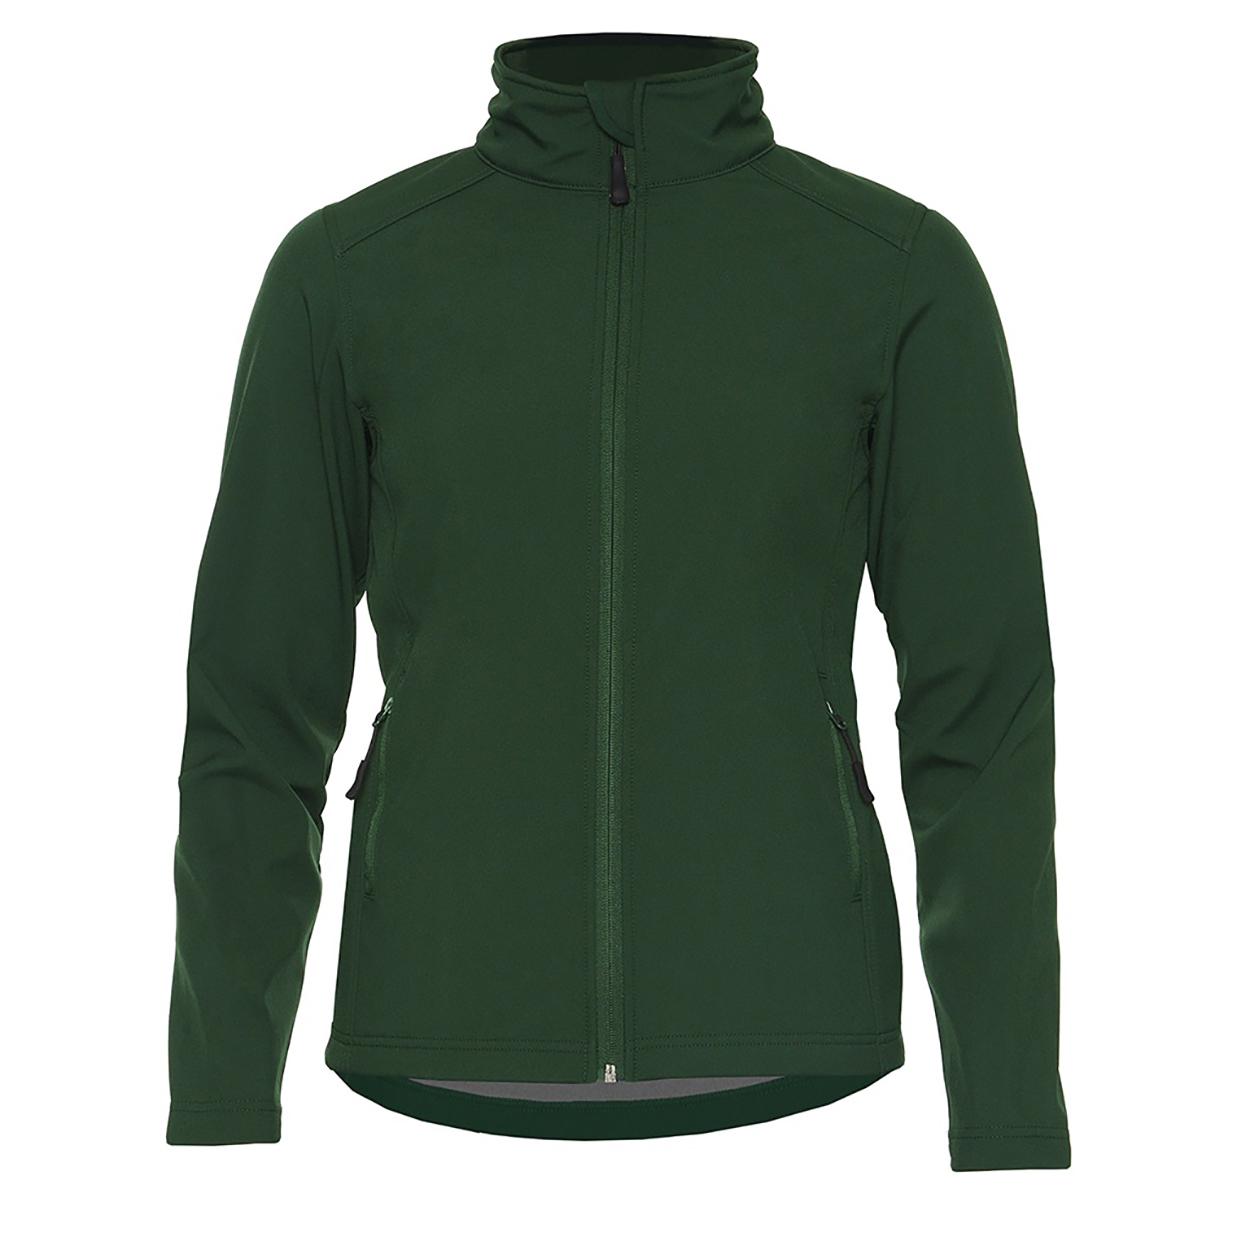 Gildan Womens/Ladies Hammer Soft Shell Jacket (XXL) (Forest Green)